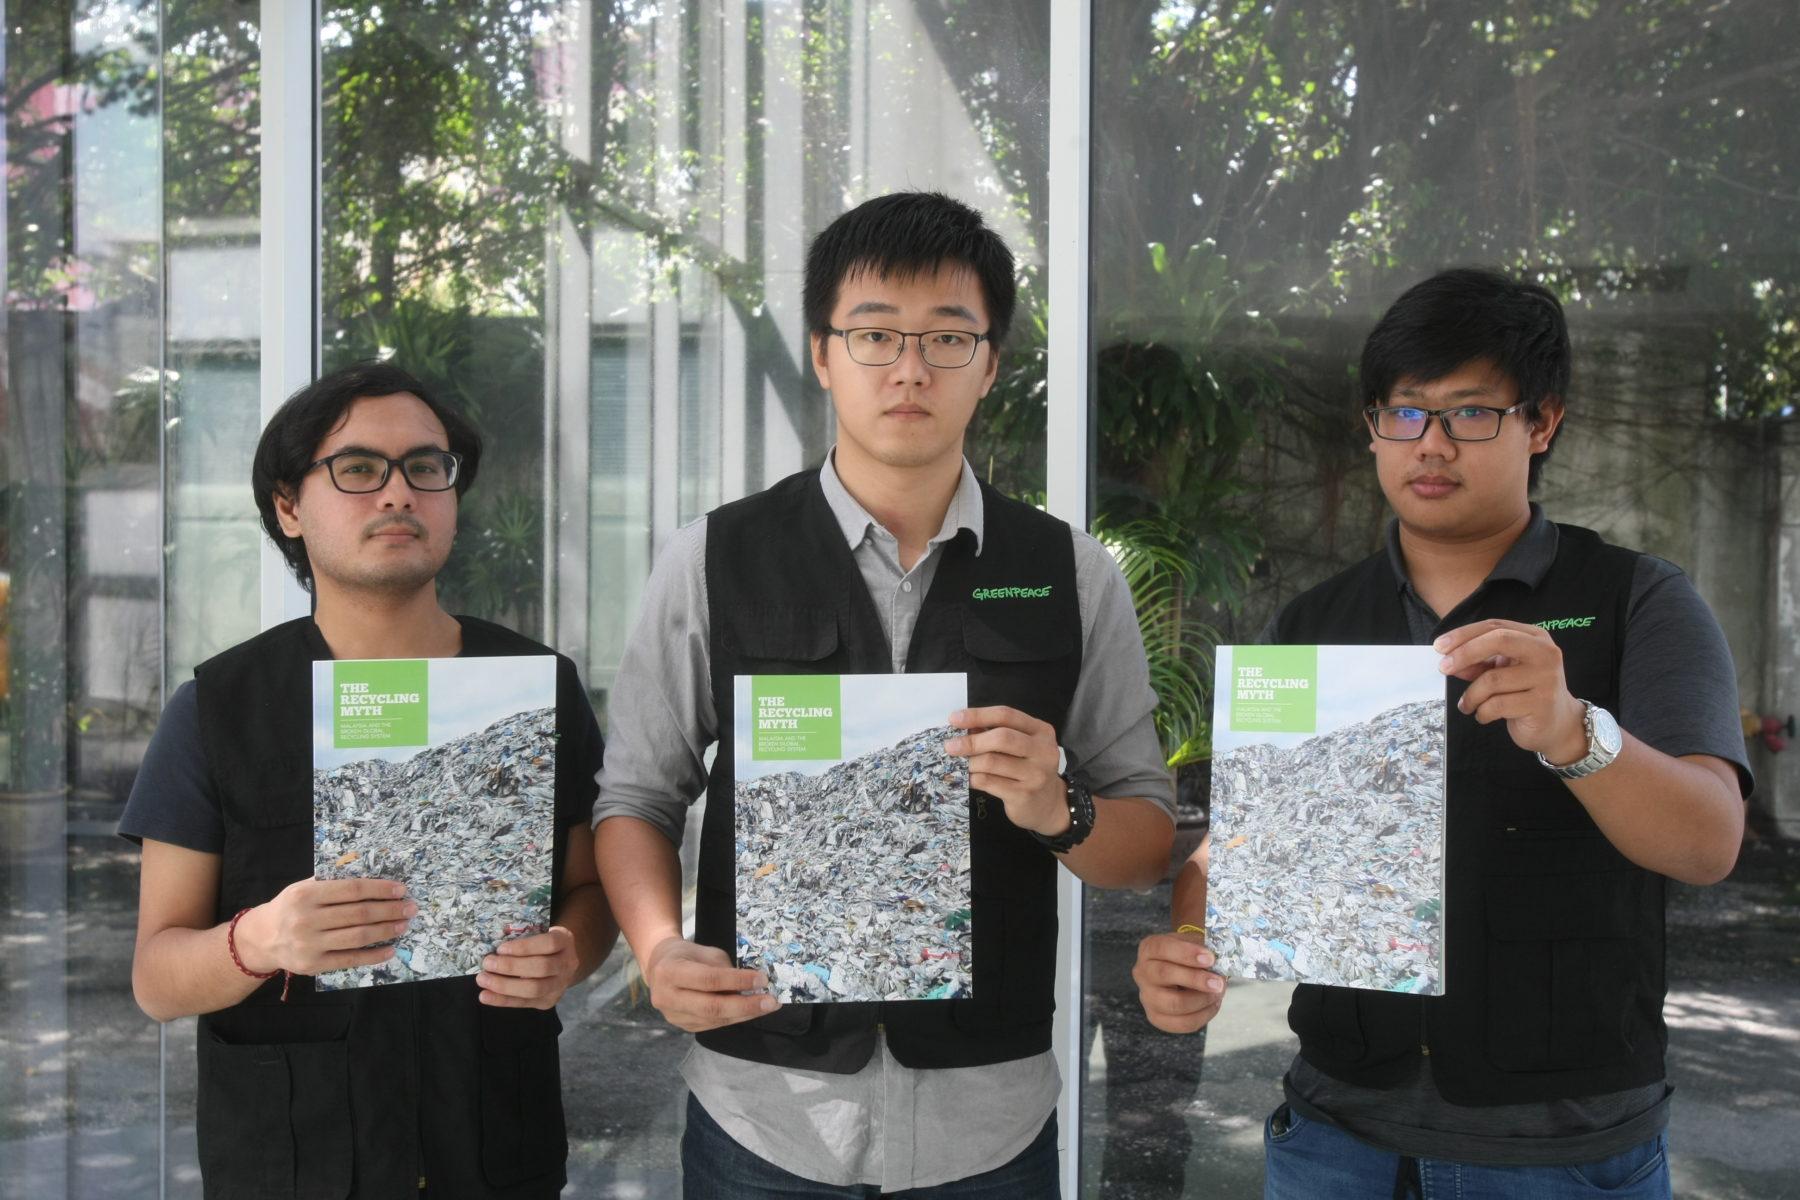 Die Greenpeace-Aktivisten Farhan Nasa, Heng Kiah Chun und Tan Wei Kiat (v. links) © Greenpeace Malaysia